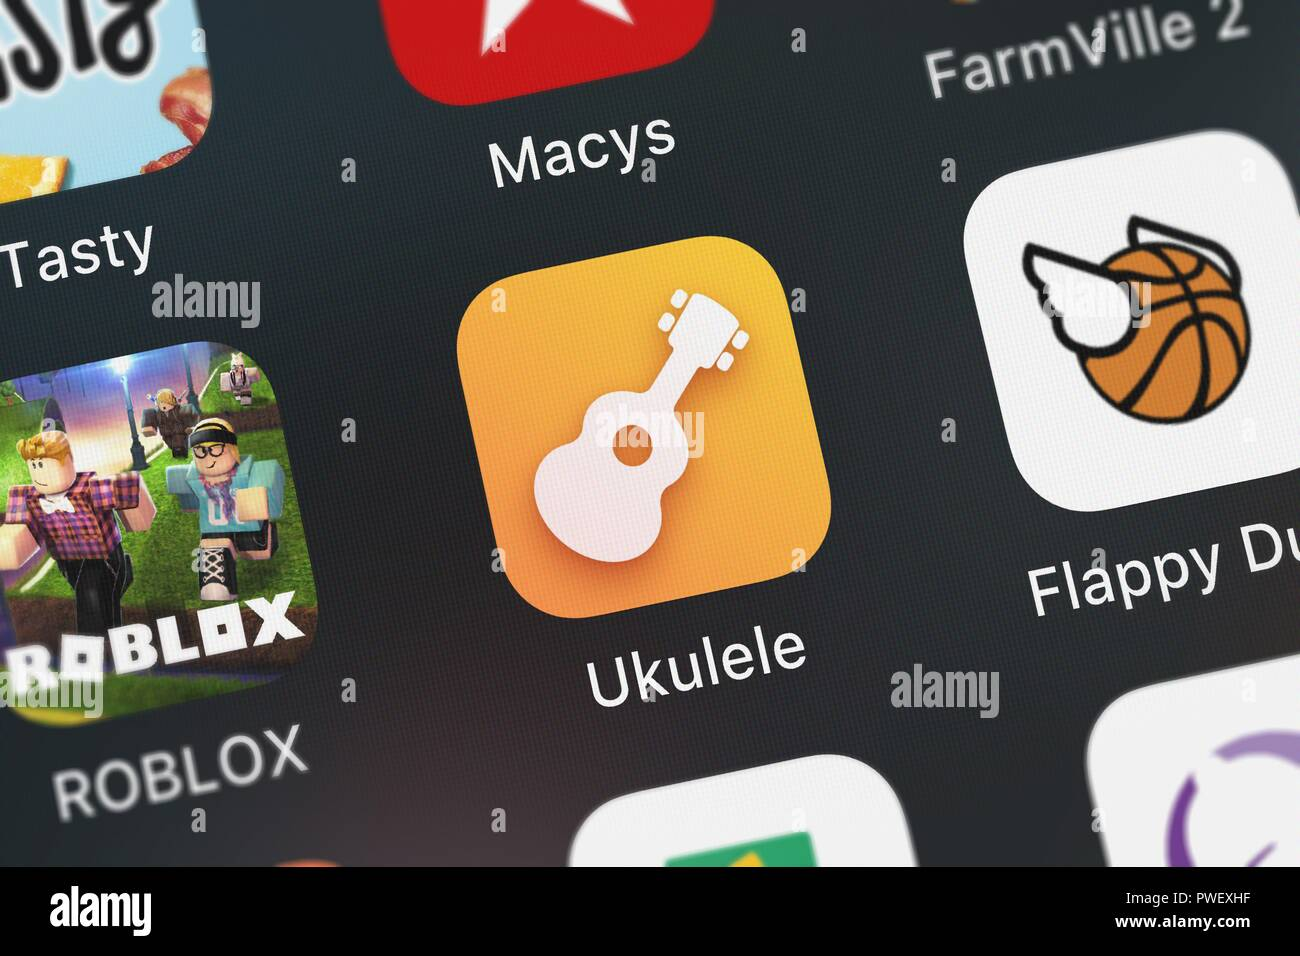 Ukulele Songs Stockfotos & Ukulele Songs Bilder - Alamy